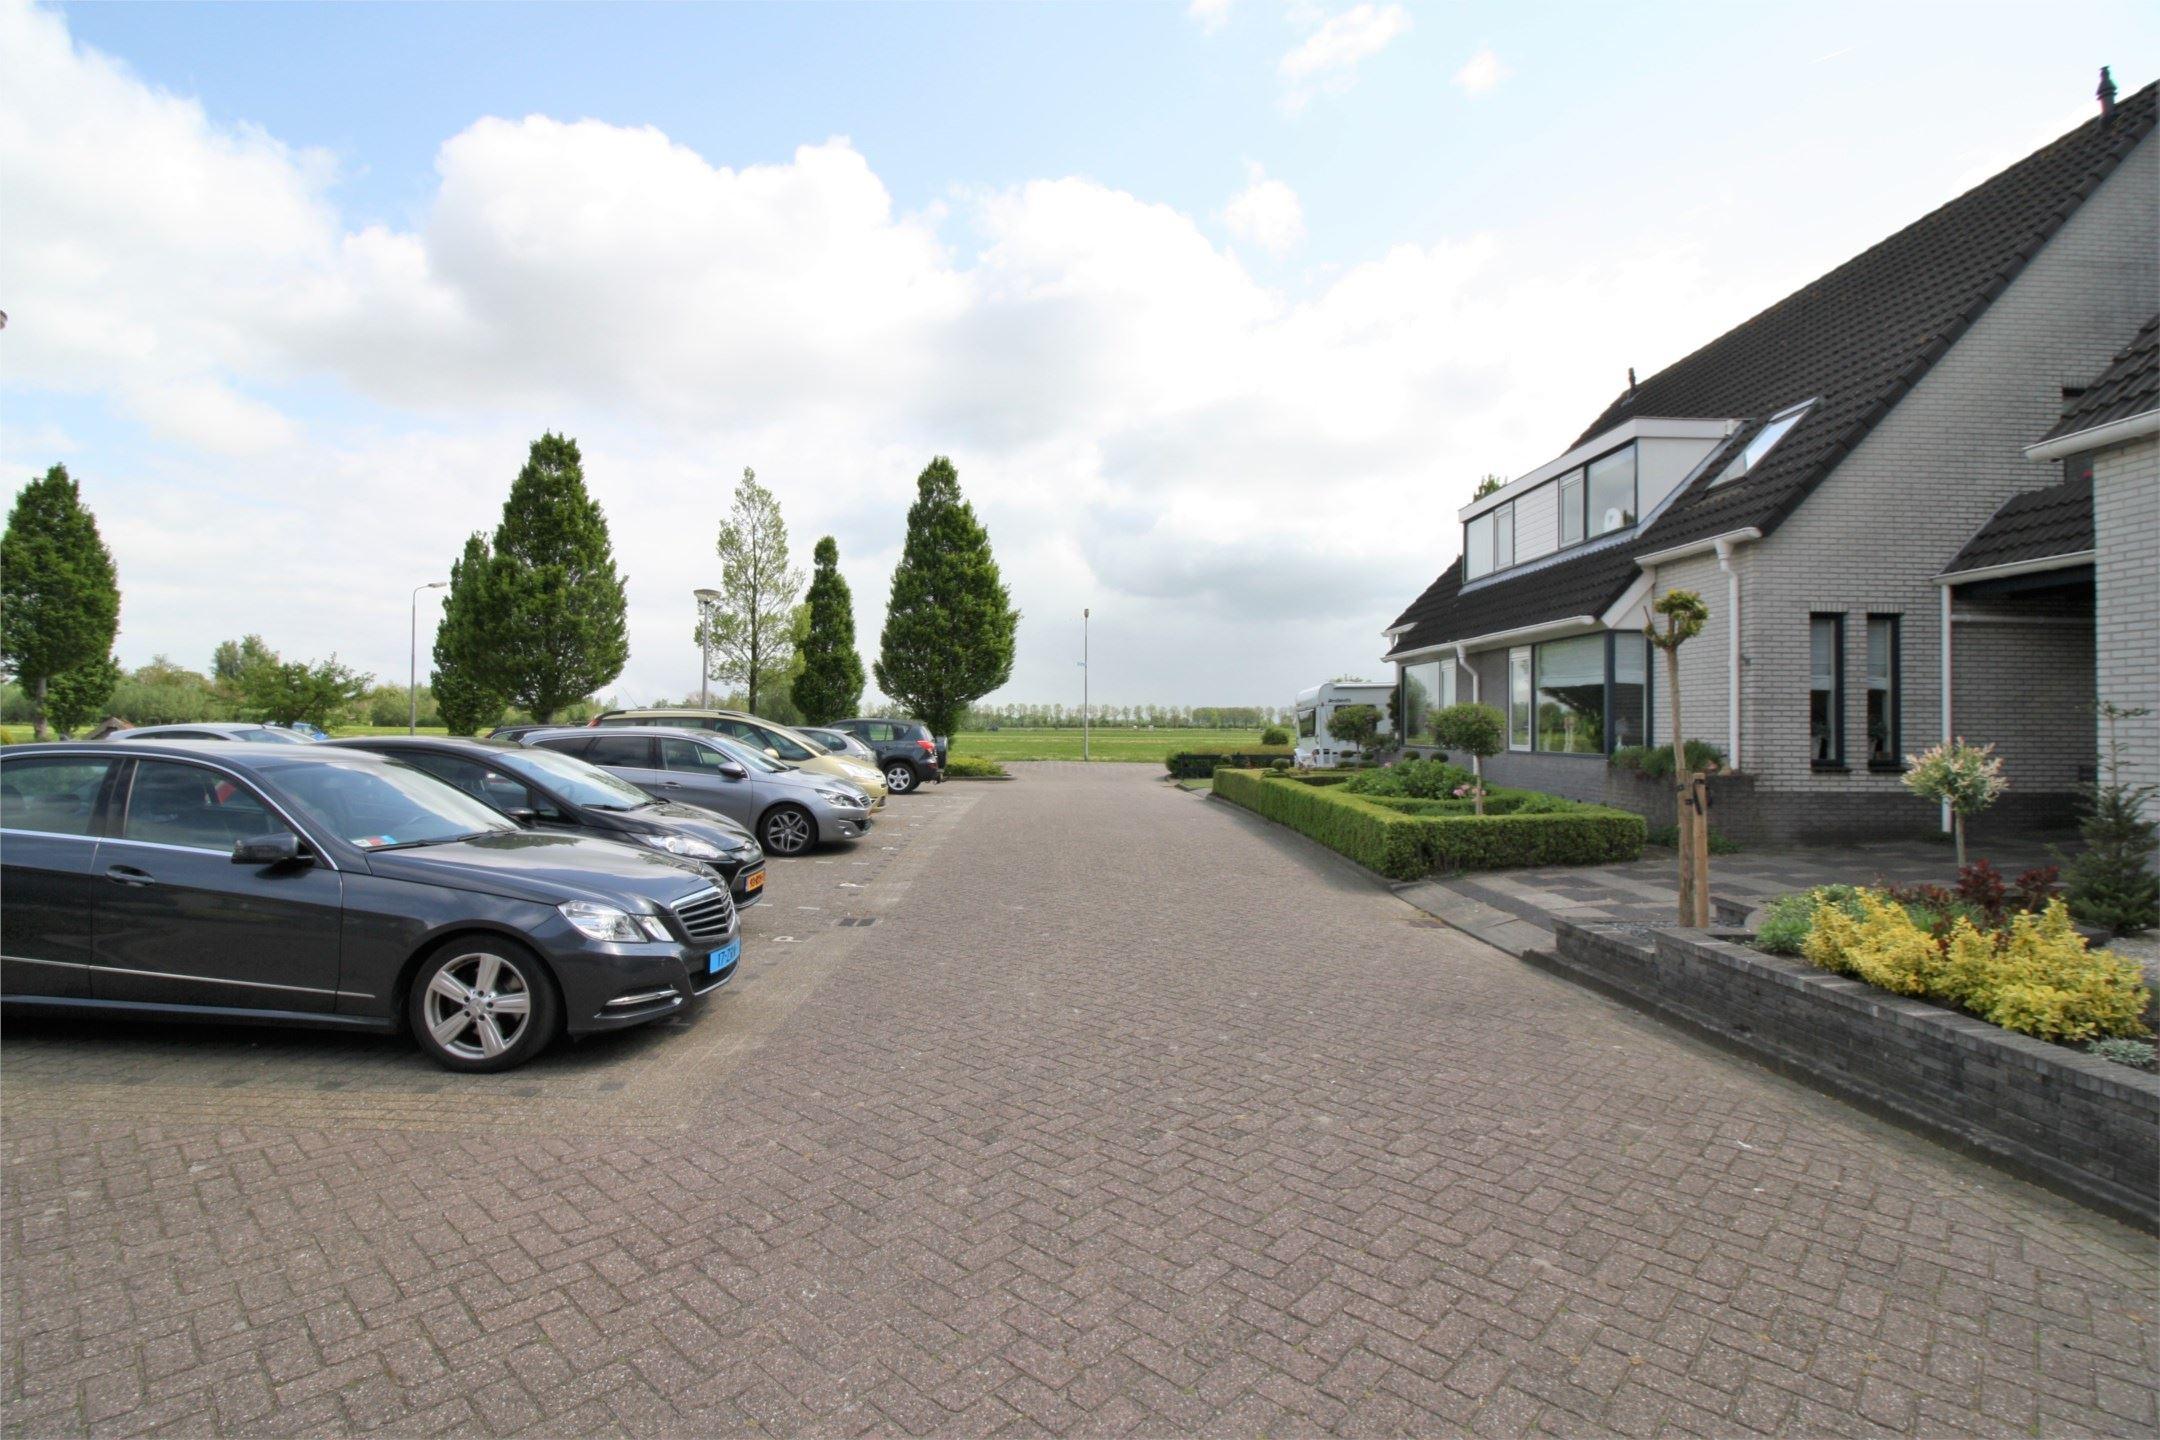 Huis te koop: Wouter van Langherakelaan 66 2967 XH Langerak [funda]